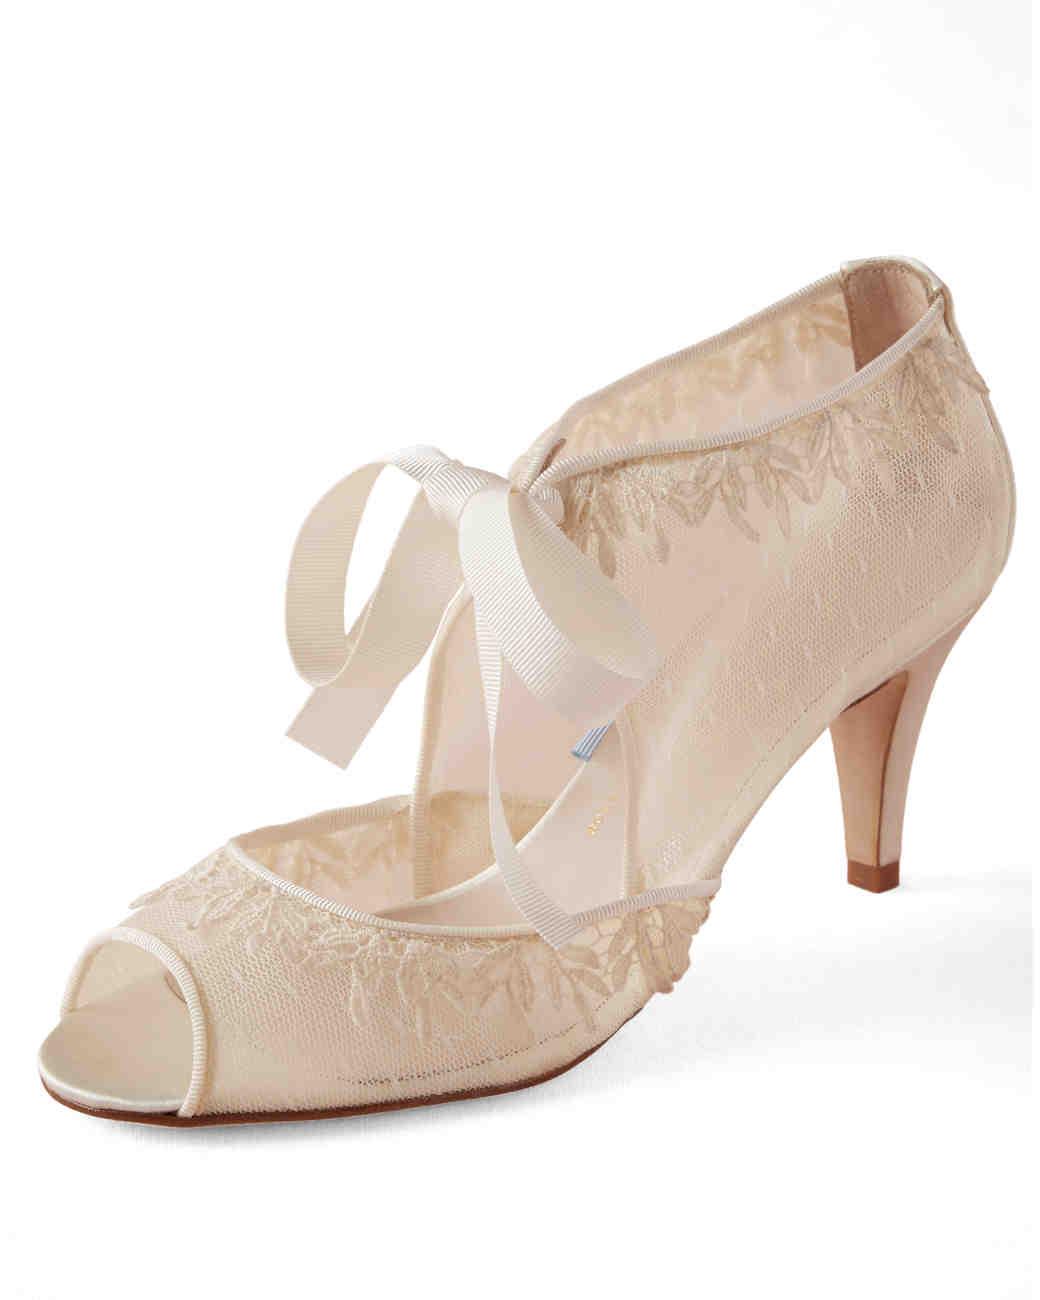 summer-wedding-shoes-bhldn-0515.jpg